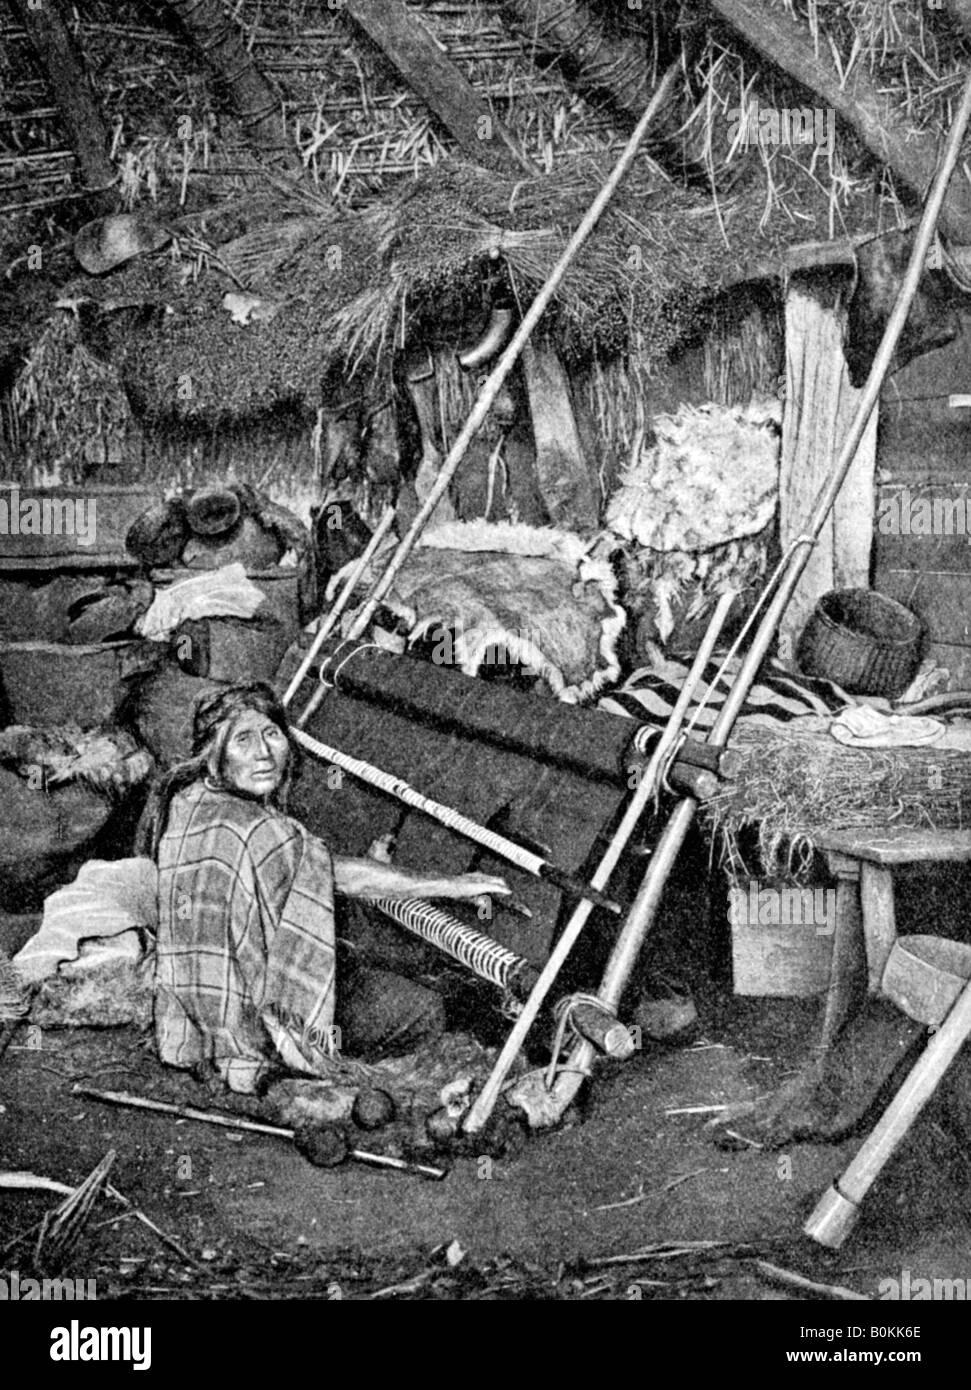 Araucanian woman weaving, Chile, 1922. - Stock Image